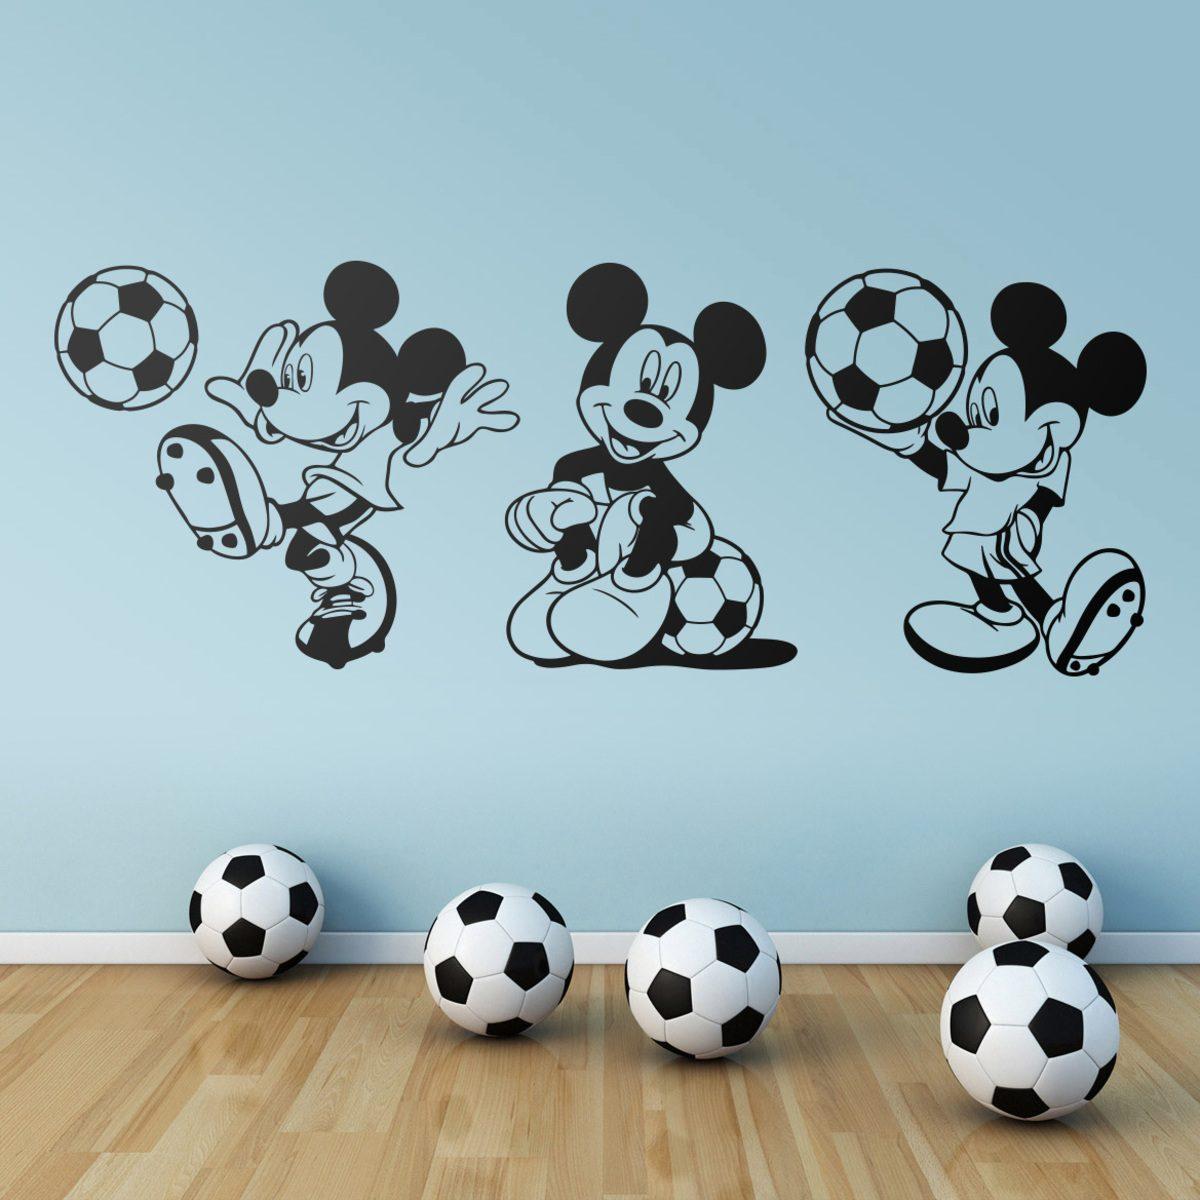 vinilo infantil con tr ptico de mickey mouse futbolista